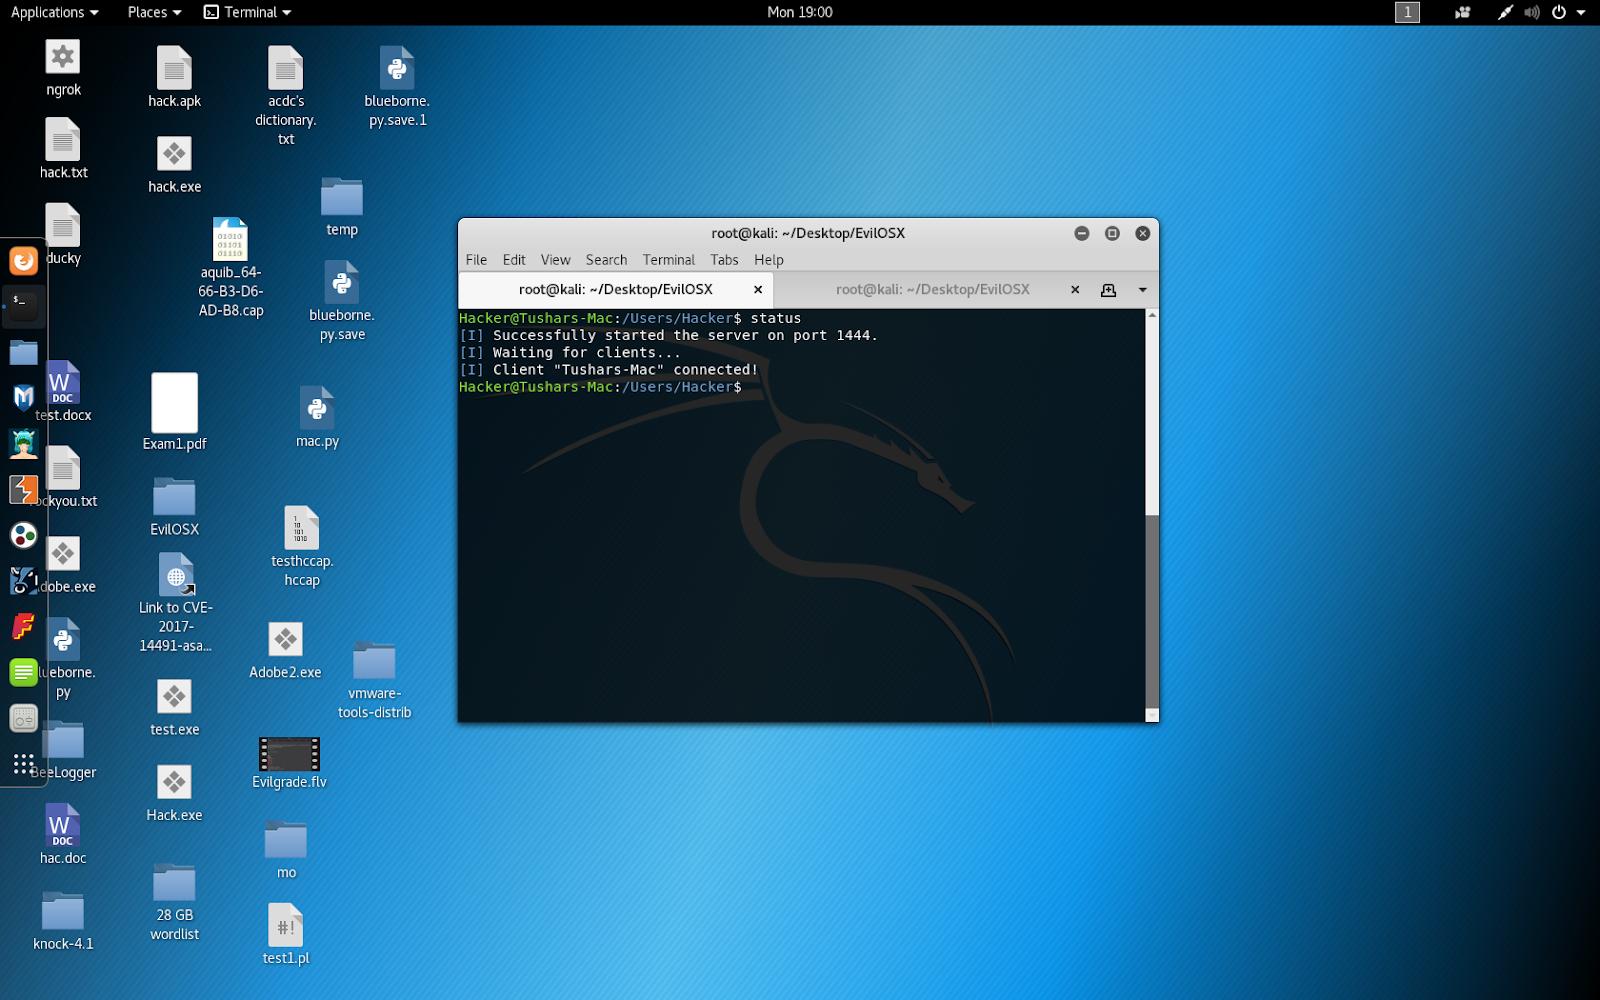 C:\Users\Tushar\Desktop\Kali Linux-2017-10-30-19-00-41.png